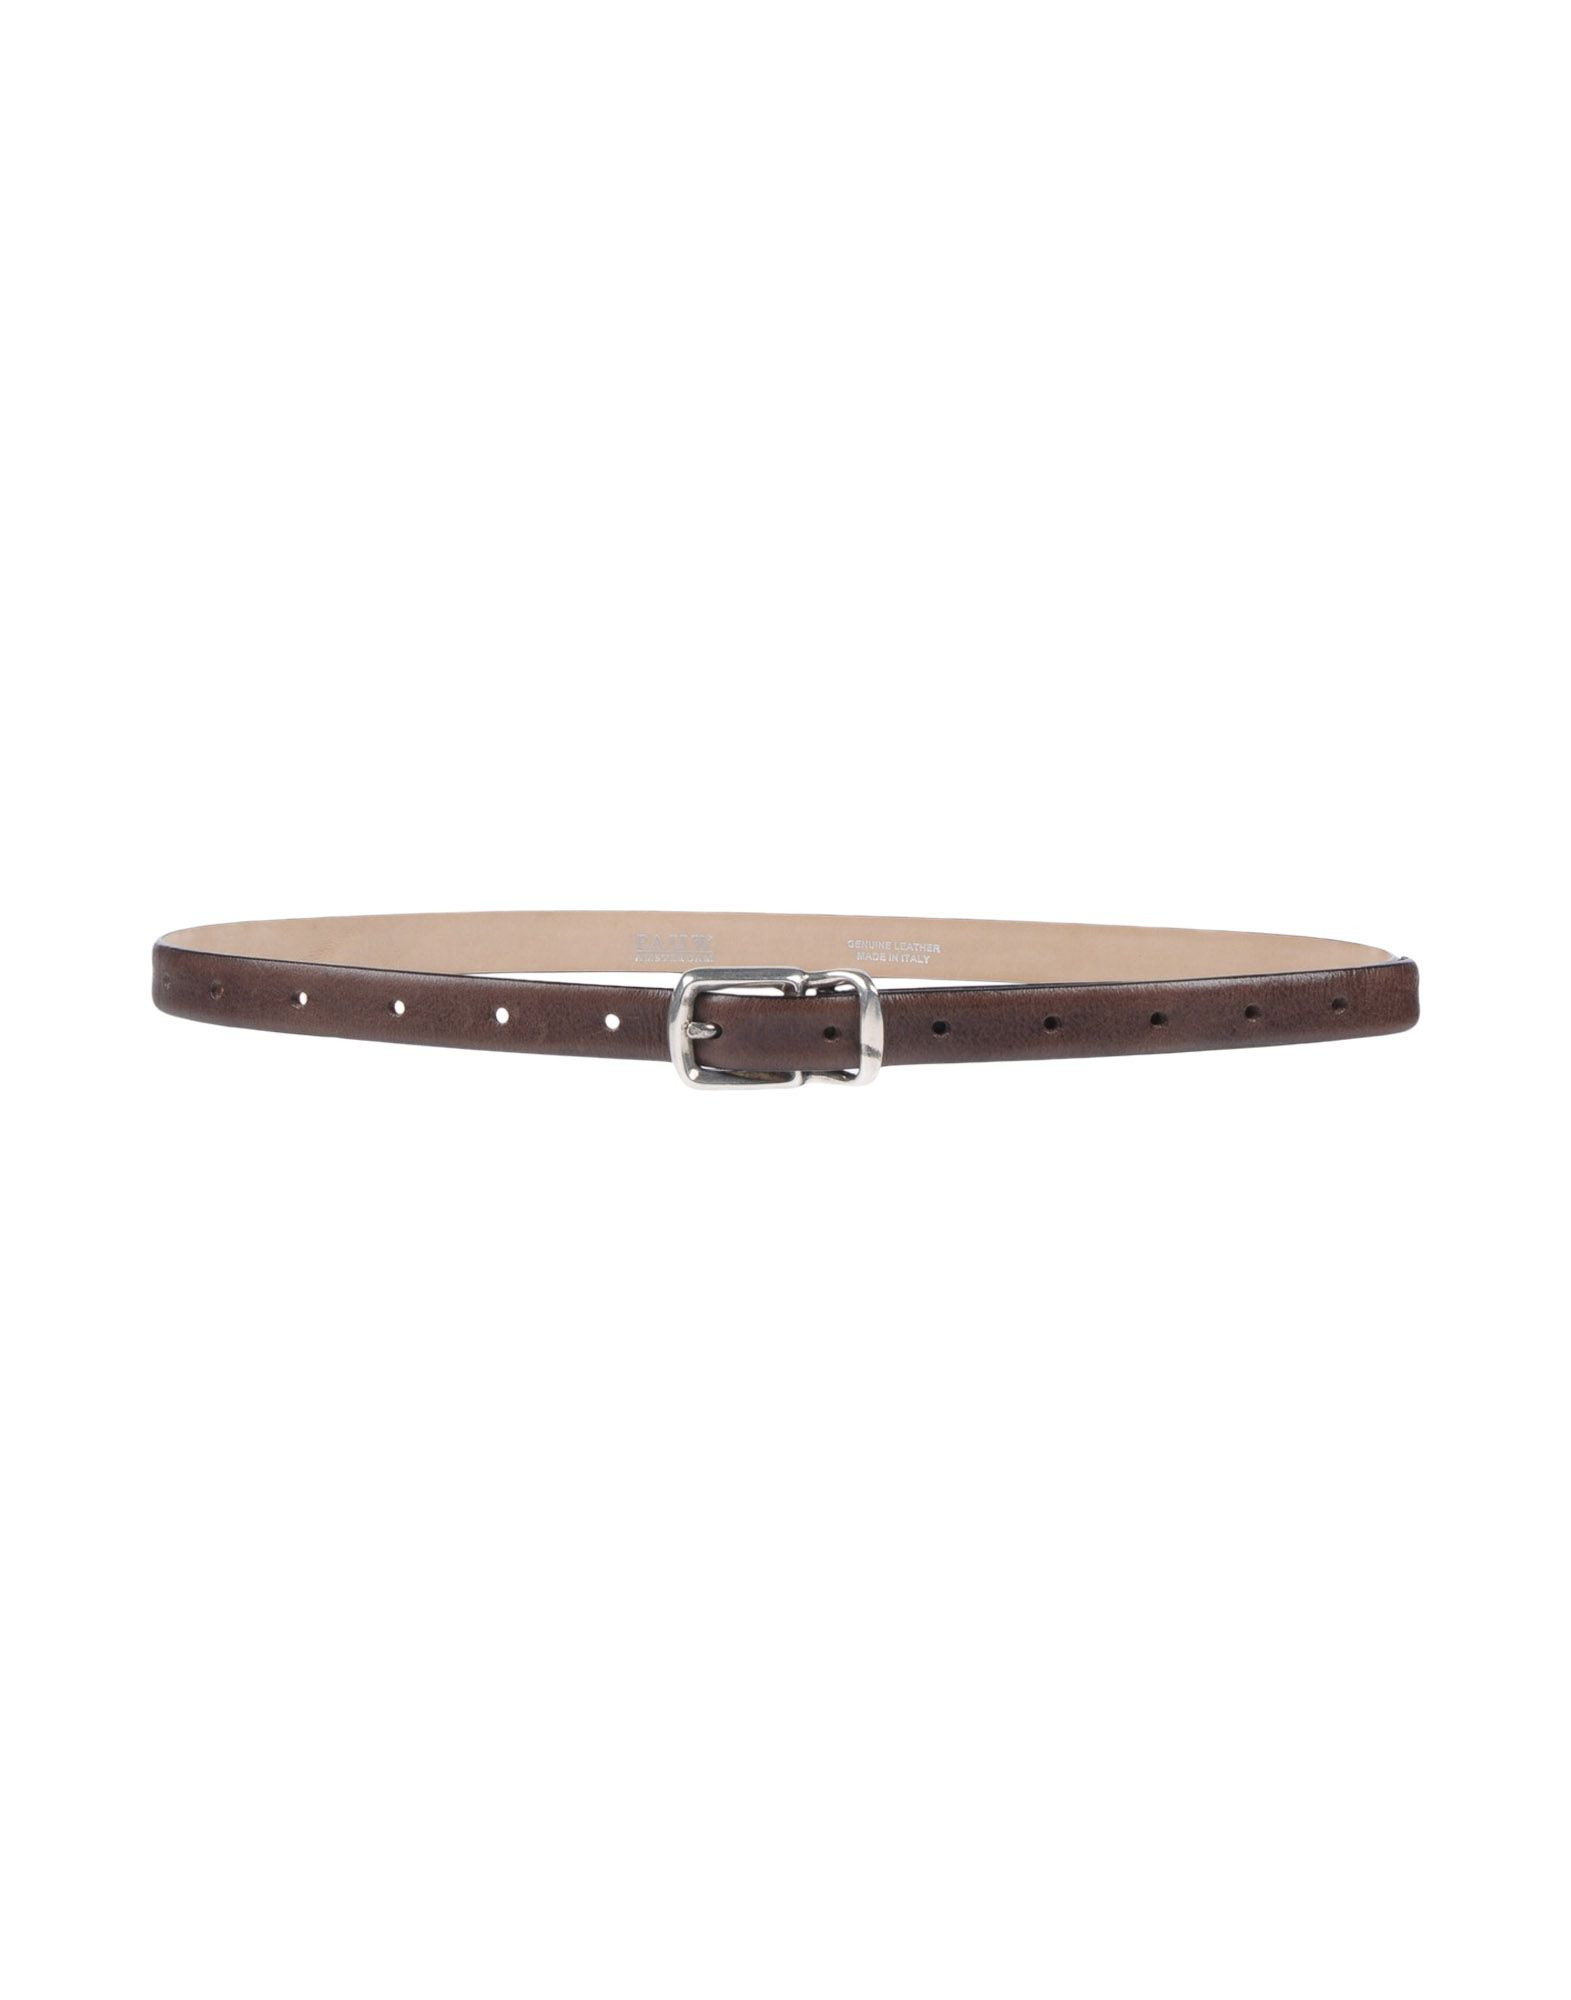 PAUW Thin Belt in Brown